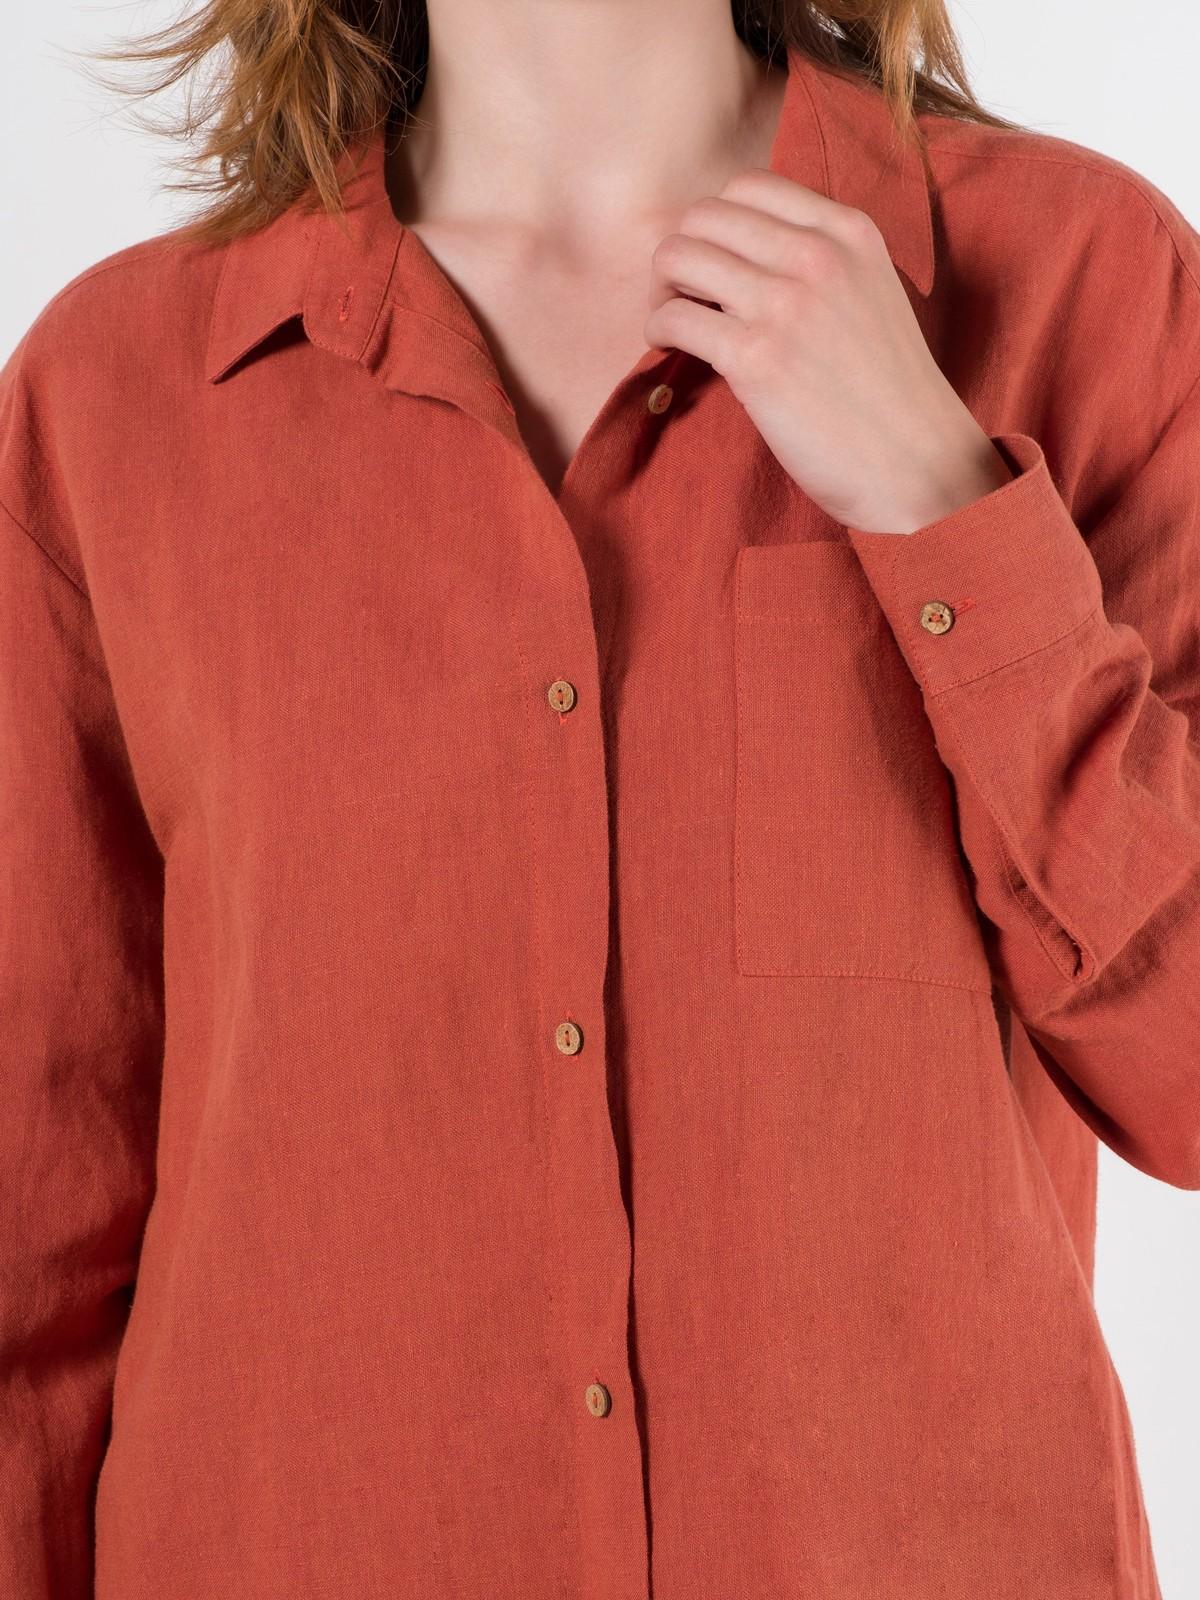 turuncu-gomlek-elbise6-1200x1600w